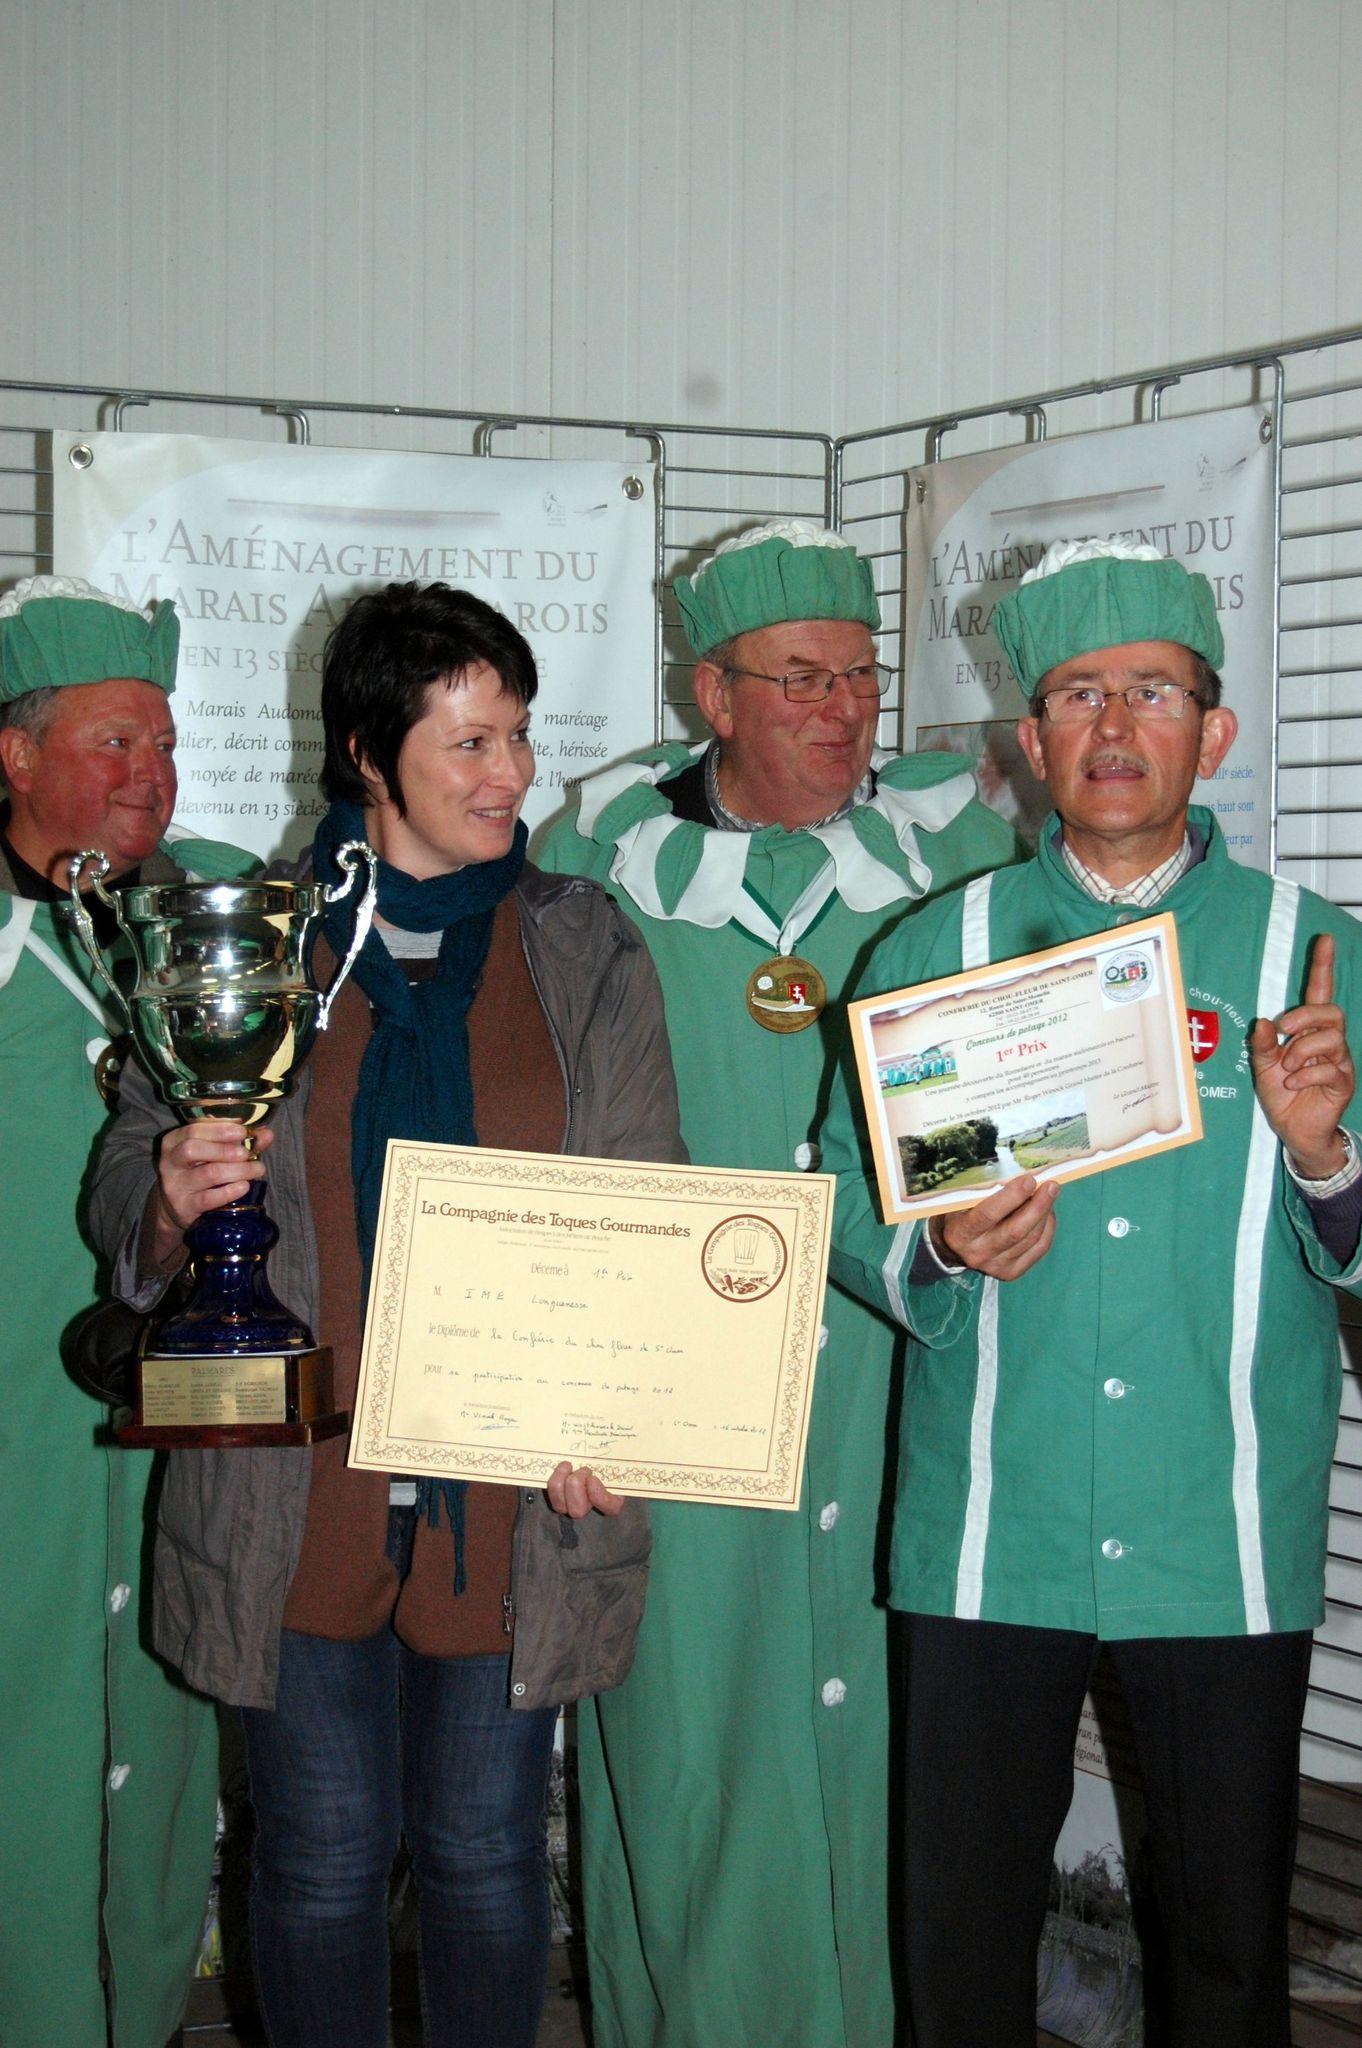 mardi 16 oct 2012 remise des prix et inauguration (22)